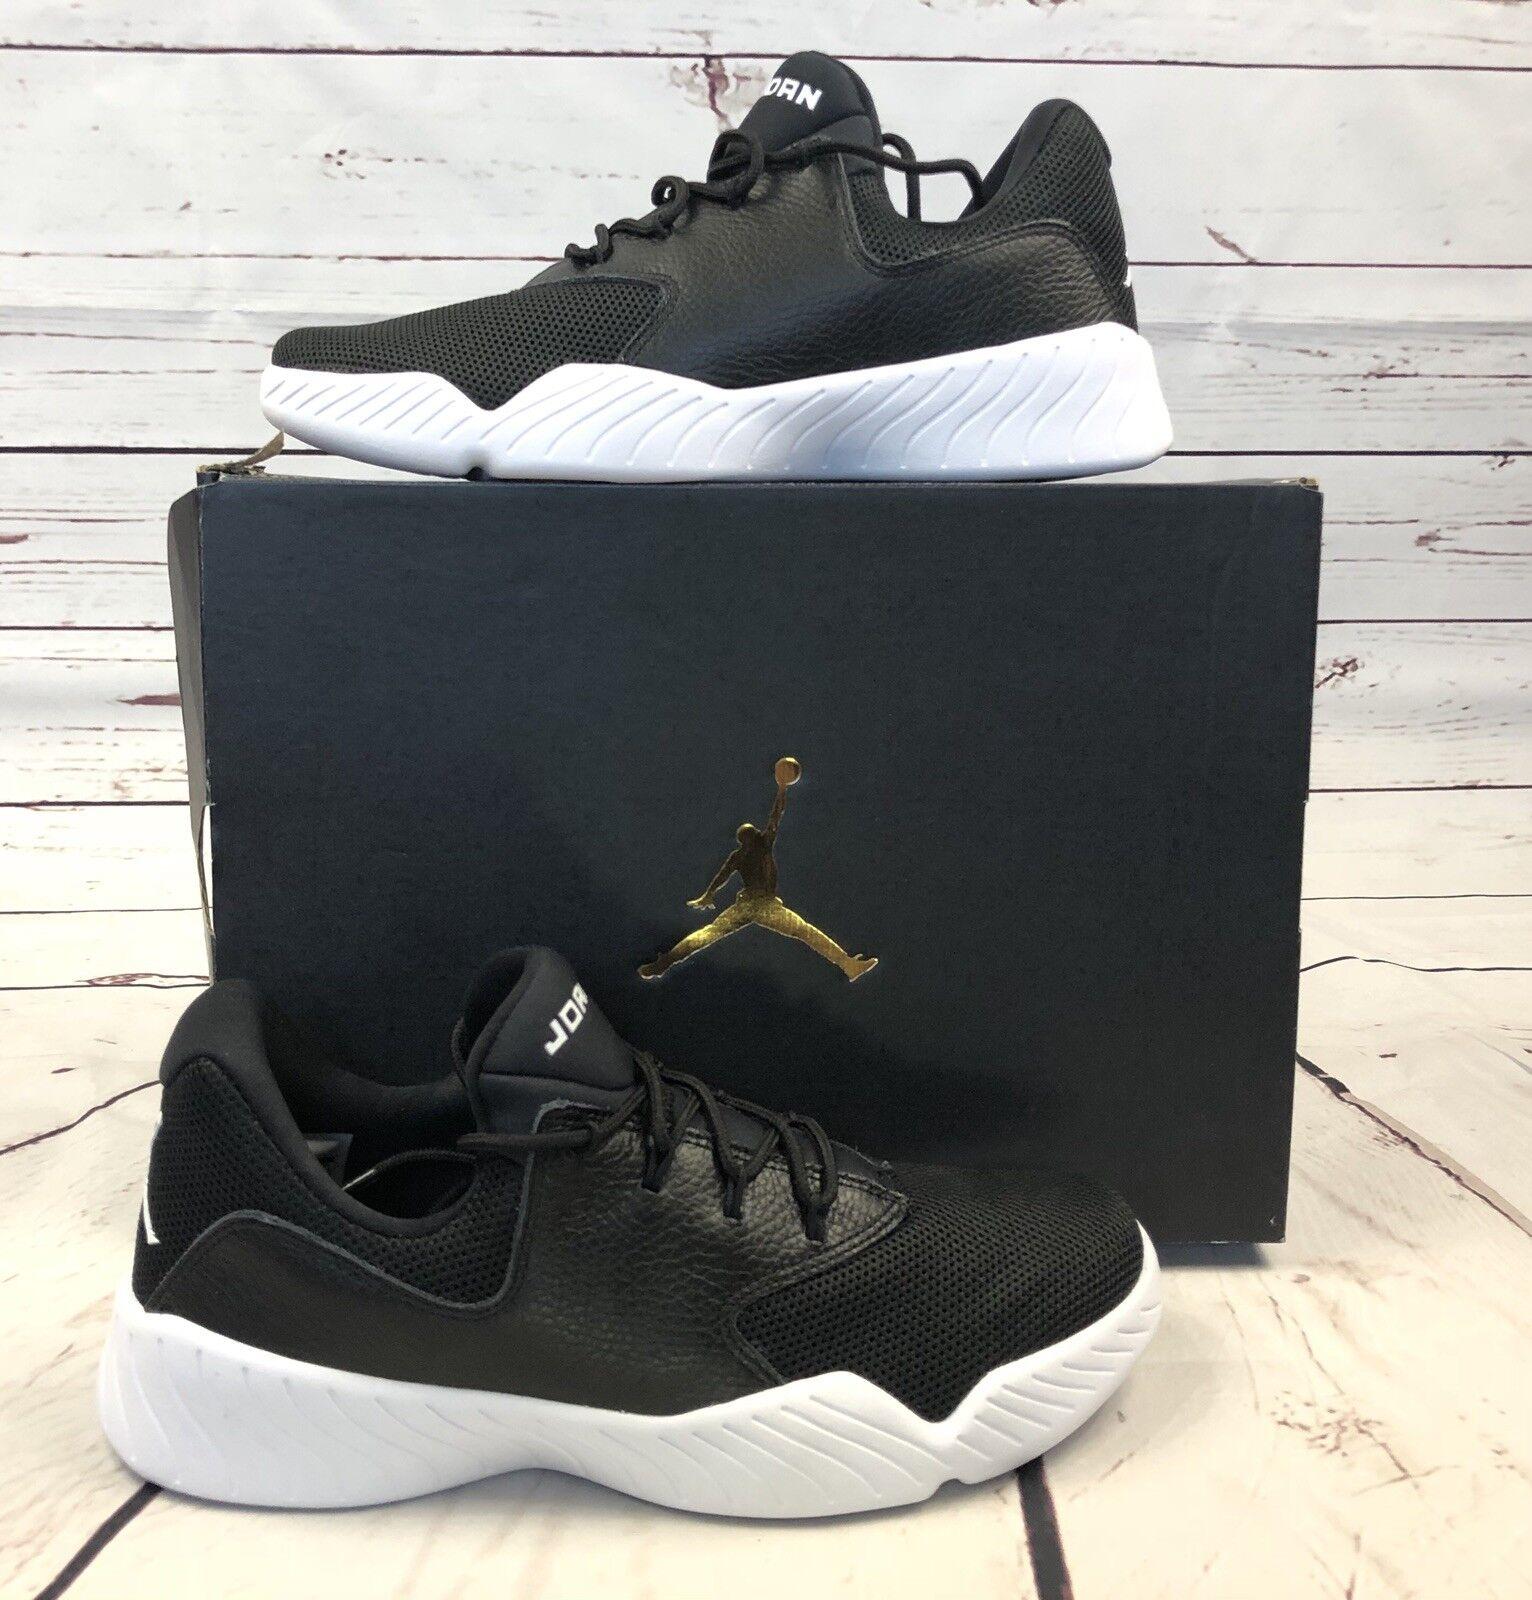 Jordan J23 Basketball Low scarpe da ginnastica nero nero nero bianca Uomo Dimensione 9.5 905288 010 New 5d9a0d